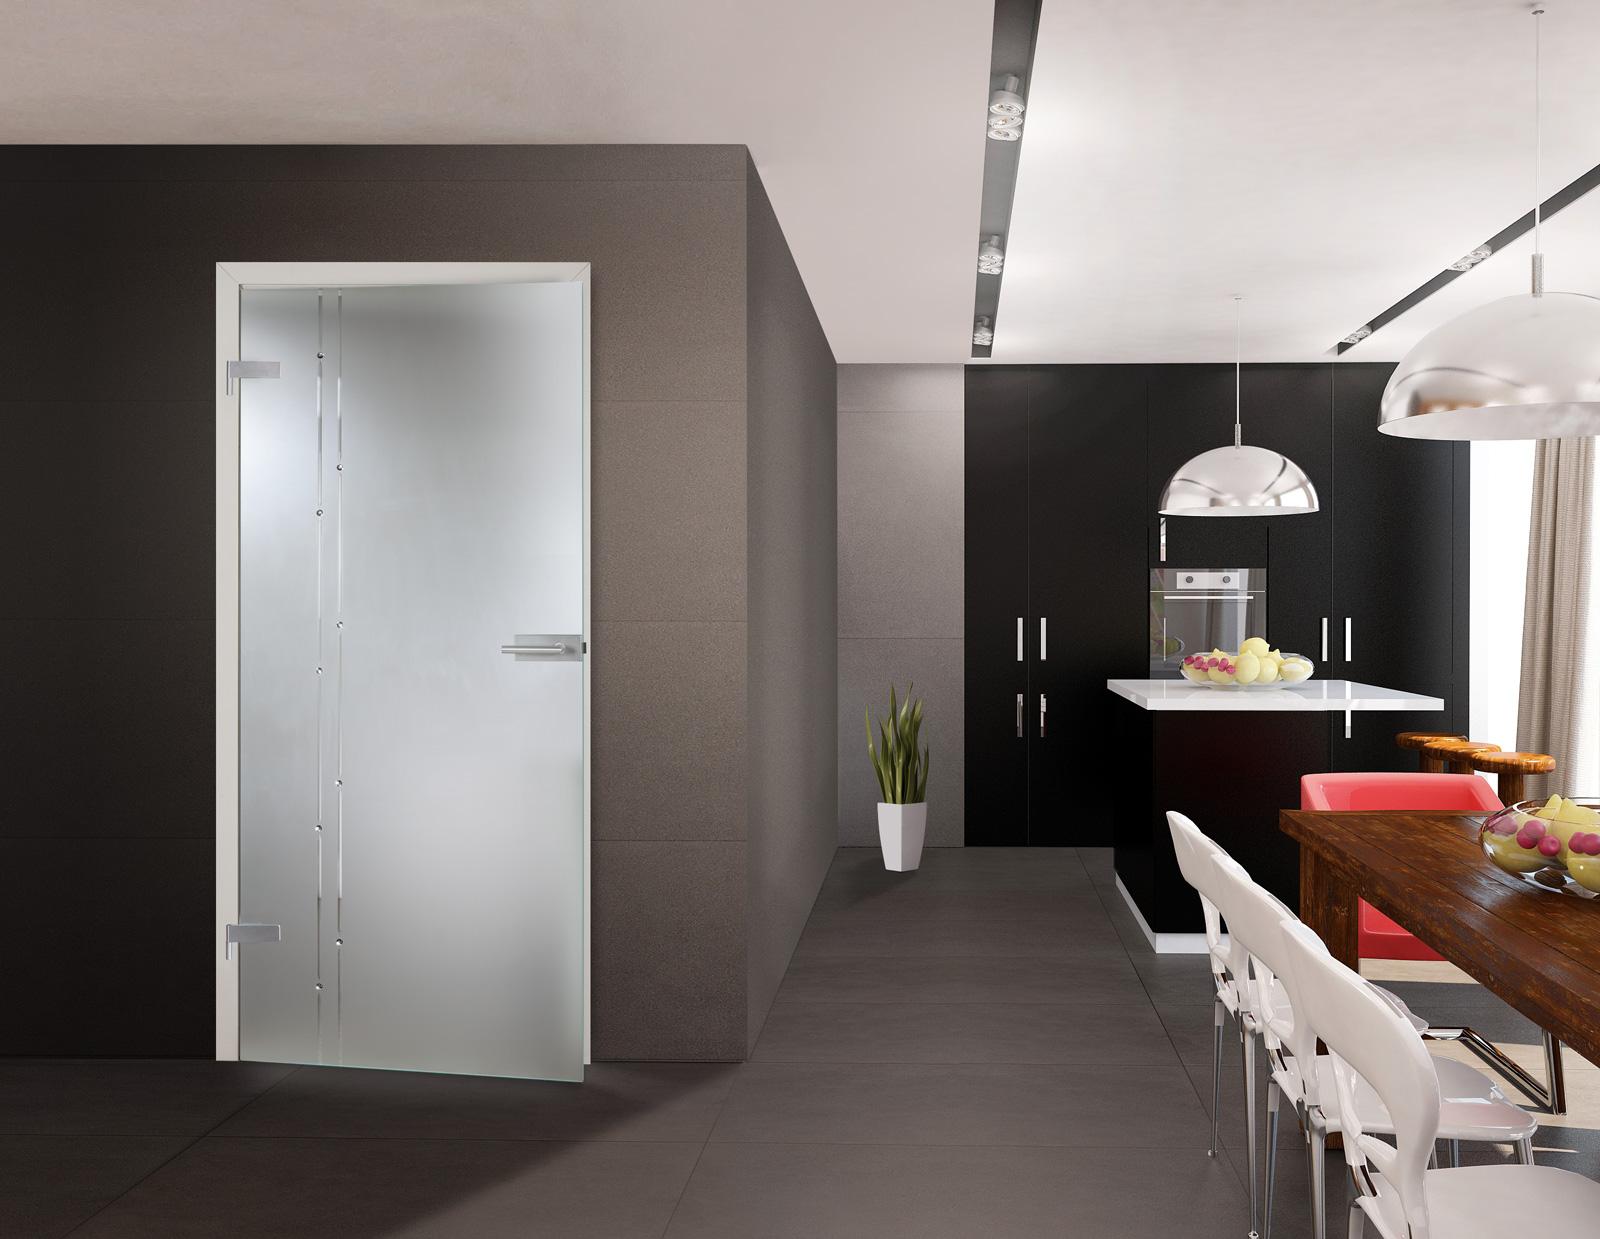 badezimmer glast r beste inspiration f r ihr interior. Black Bedroom Furniture Sets. Home Design Ideas